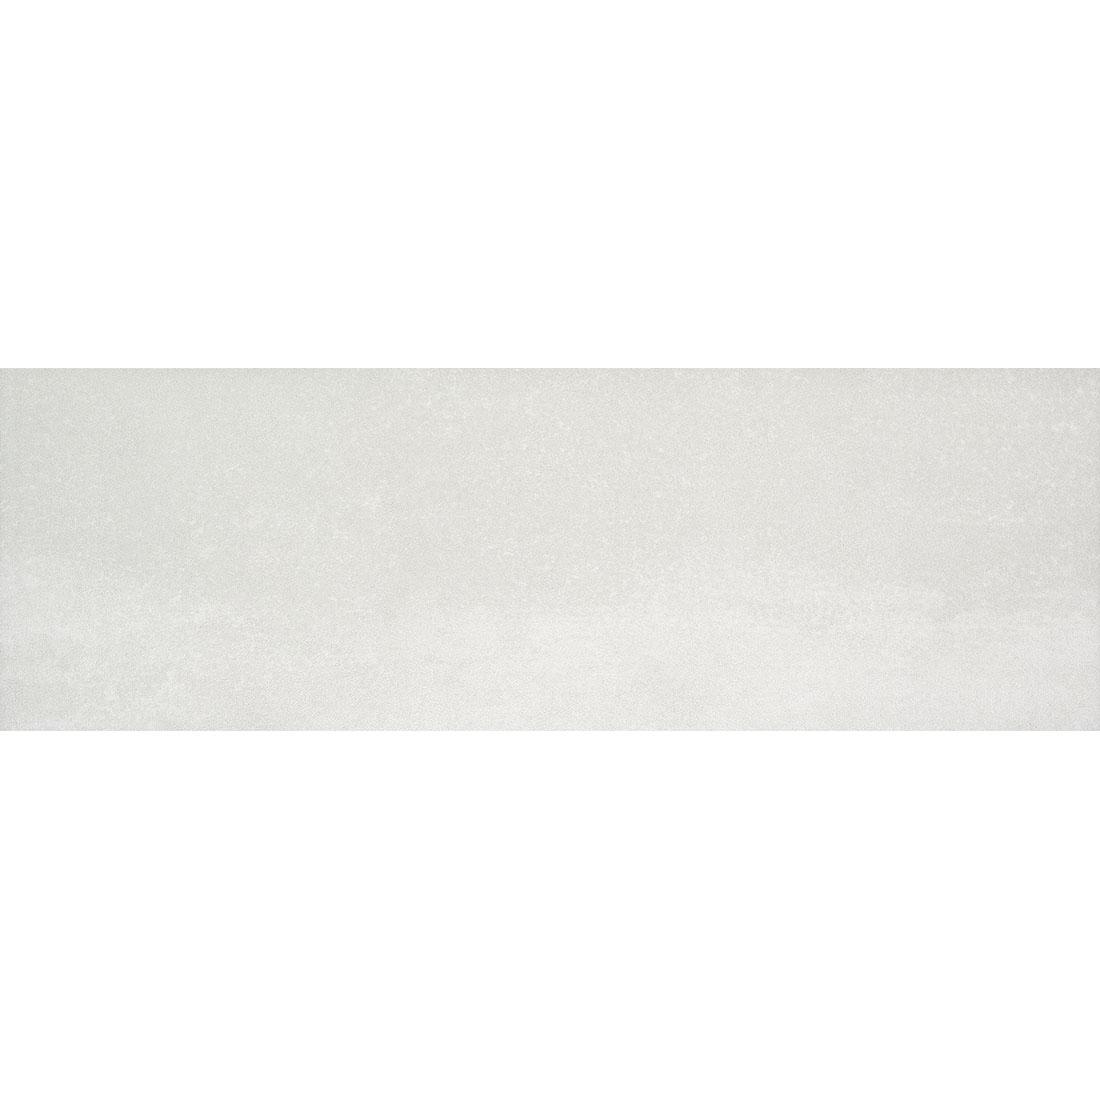 Slab 30x90 Blanco